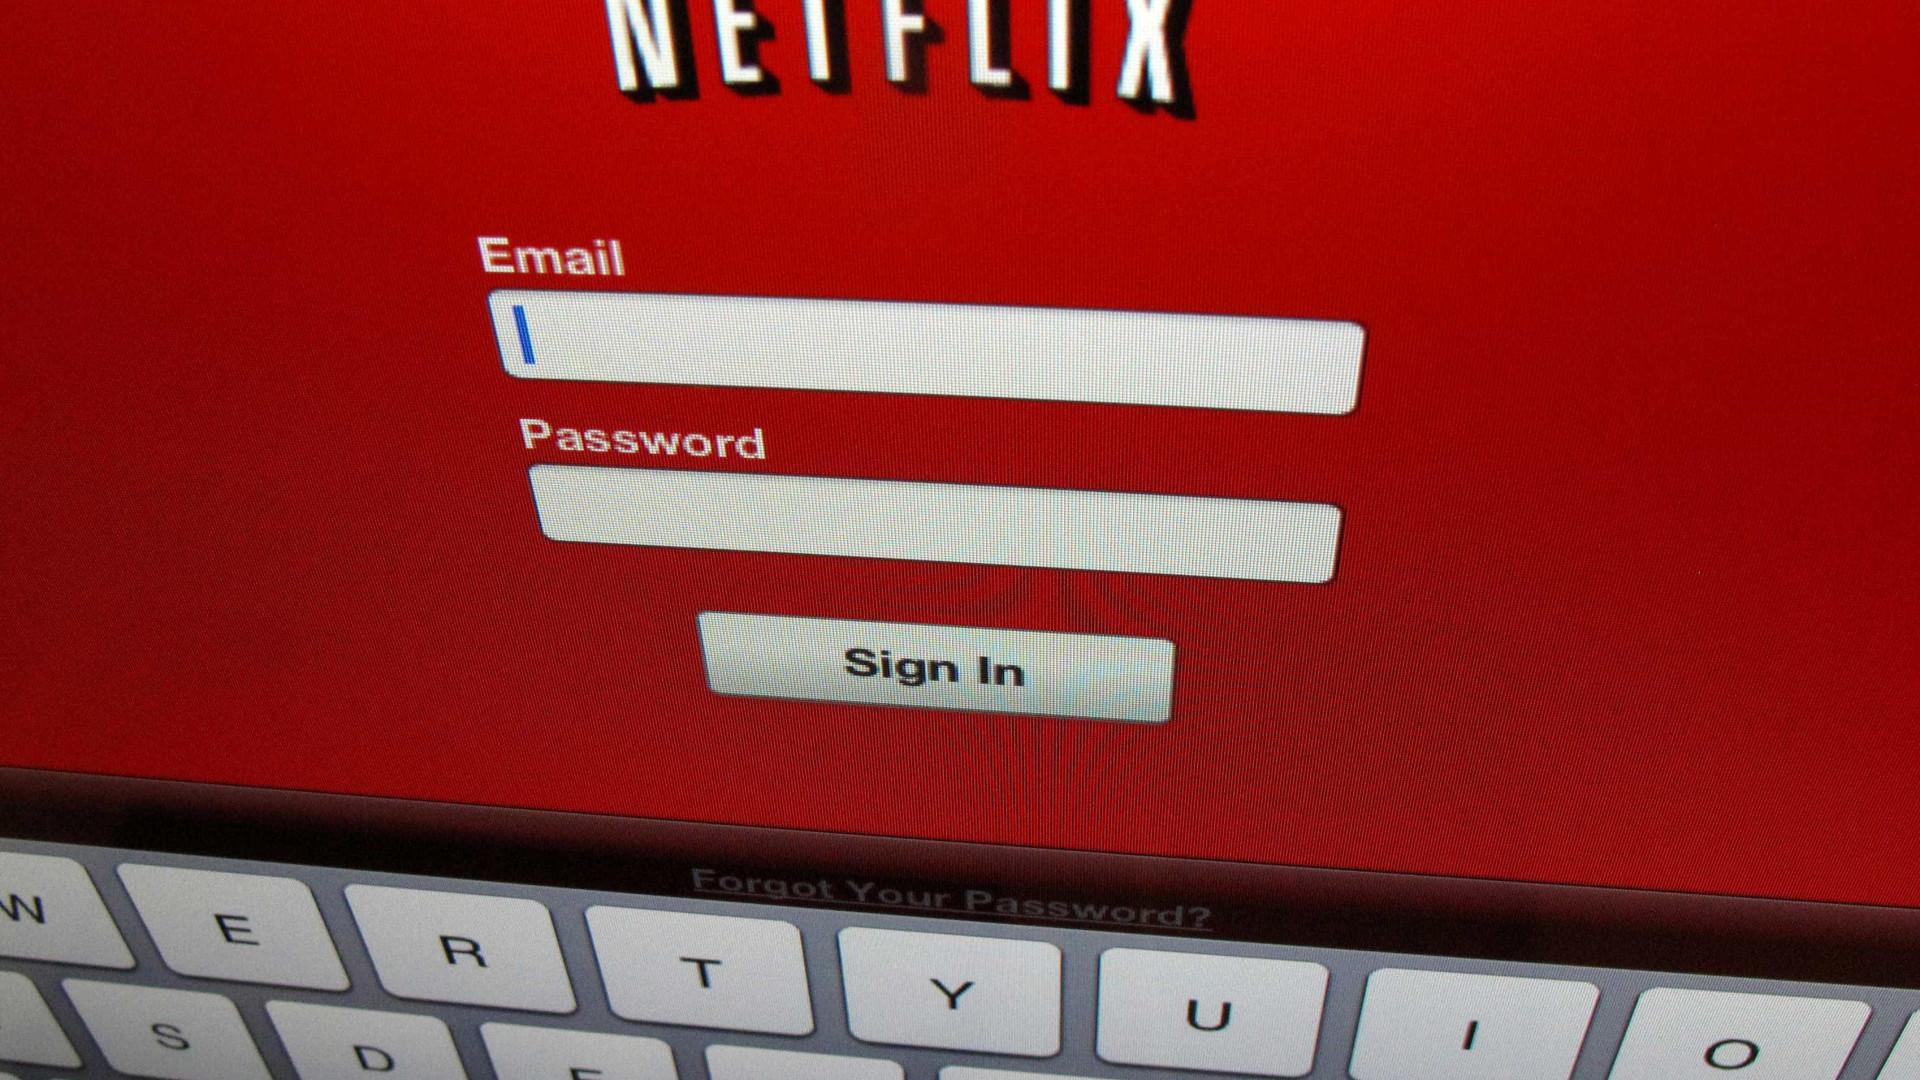 Netflix constrói estúdio para gravar séries na Europa